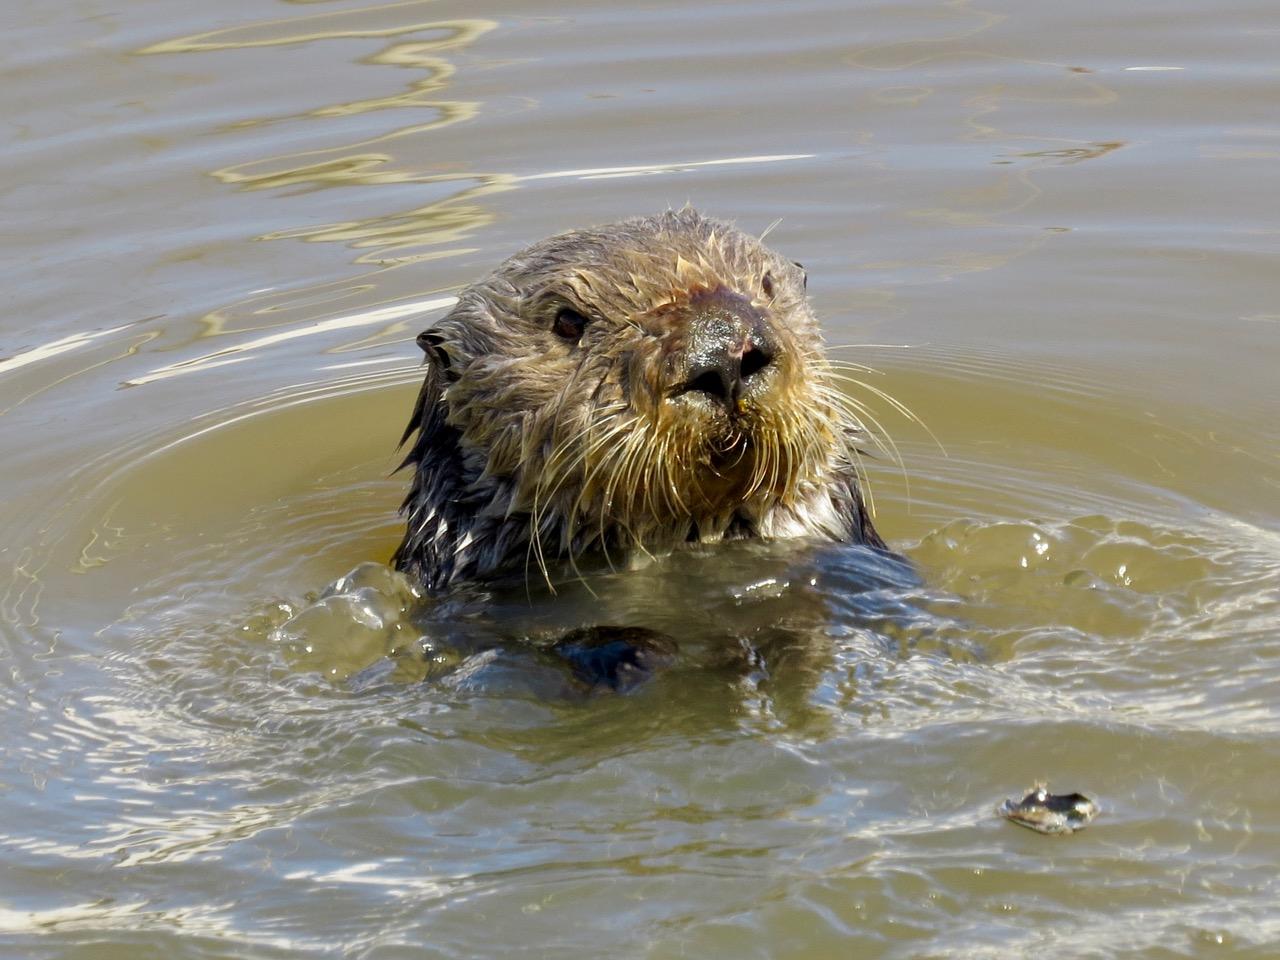 Readers' wildlife photos « Why Evolution Is True